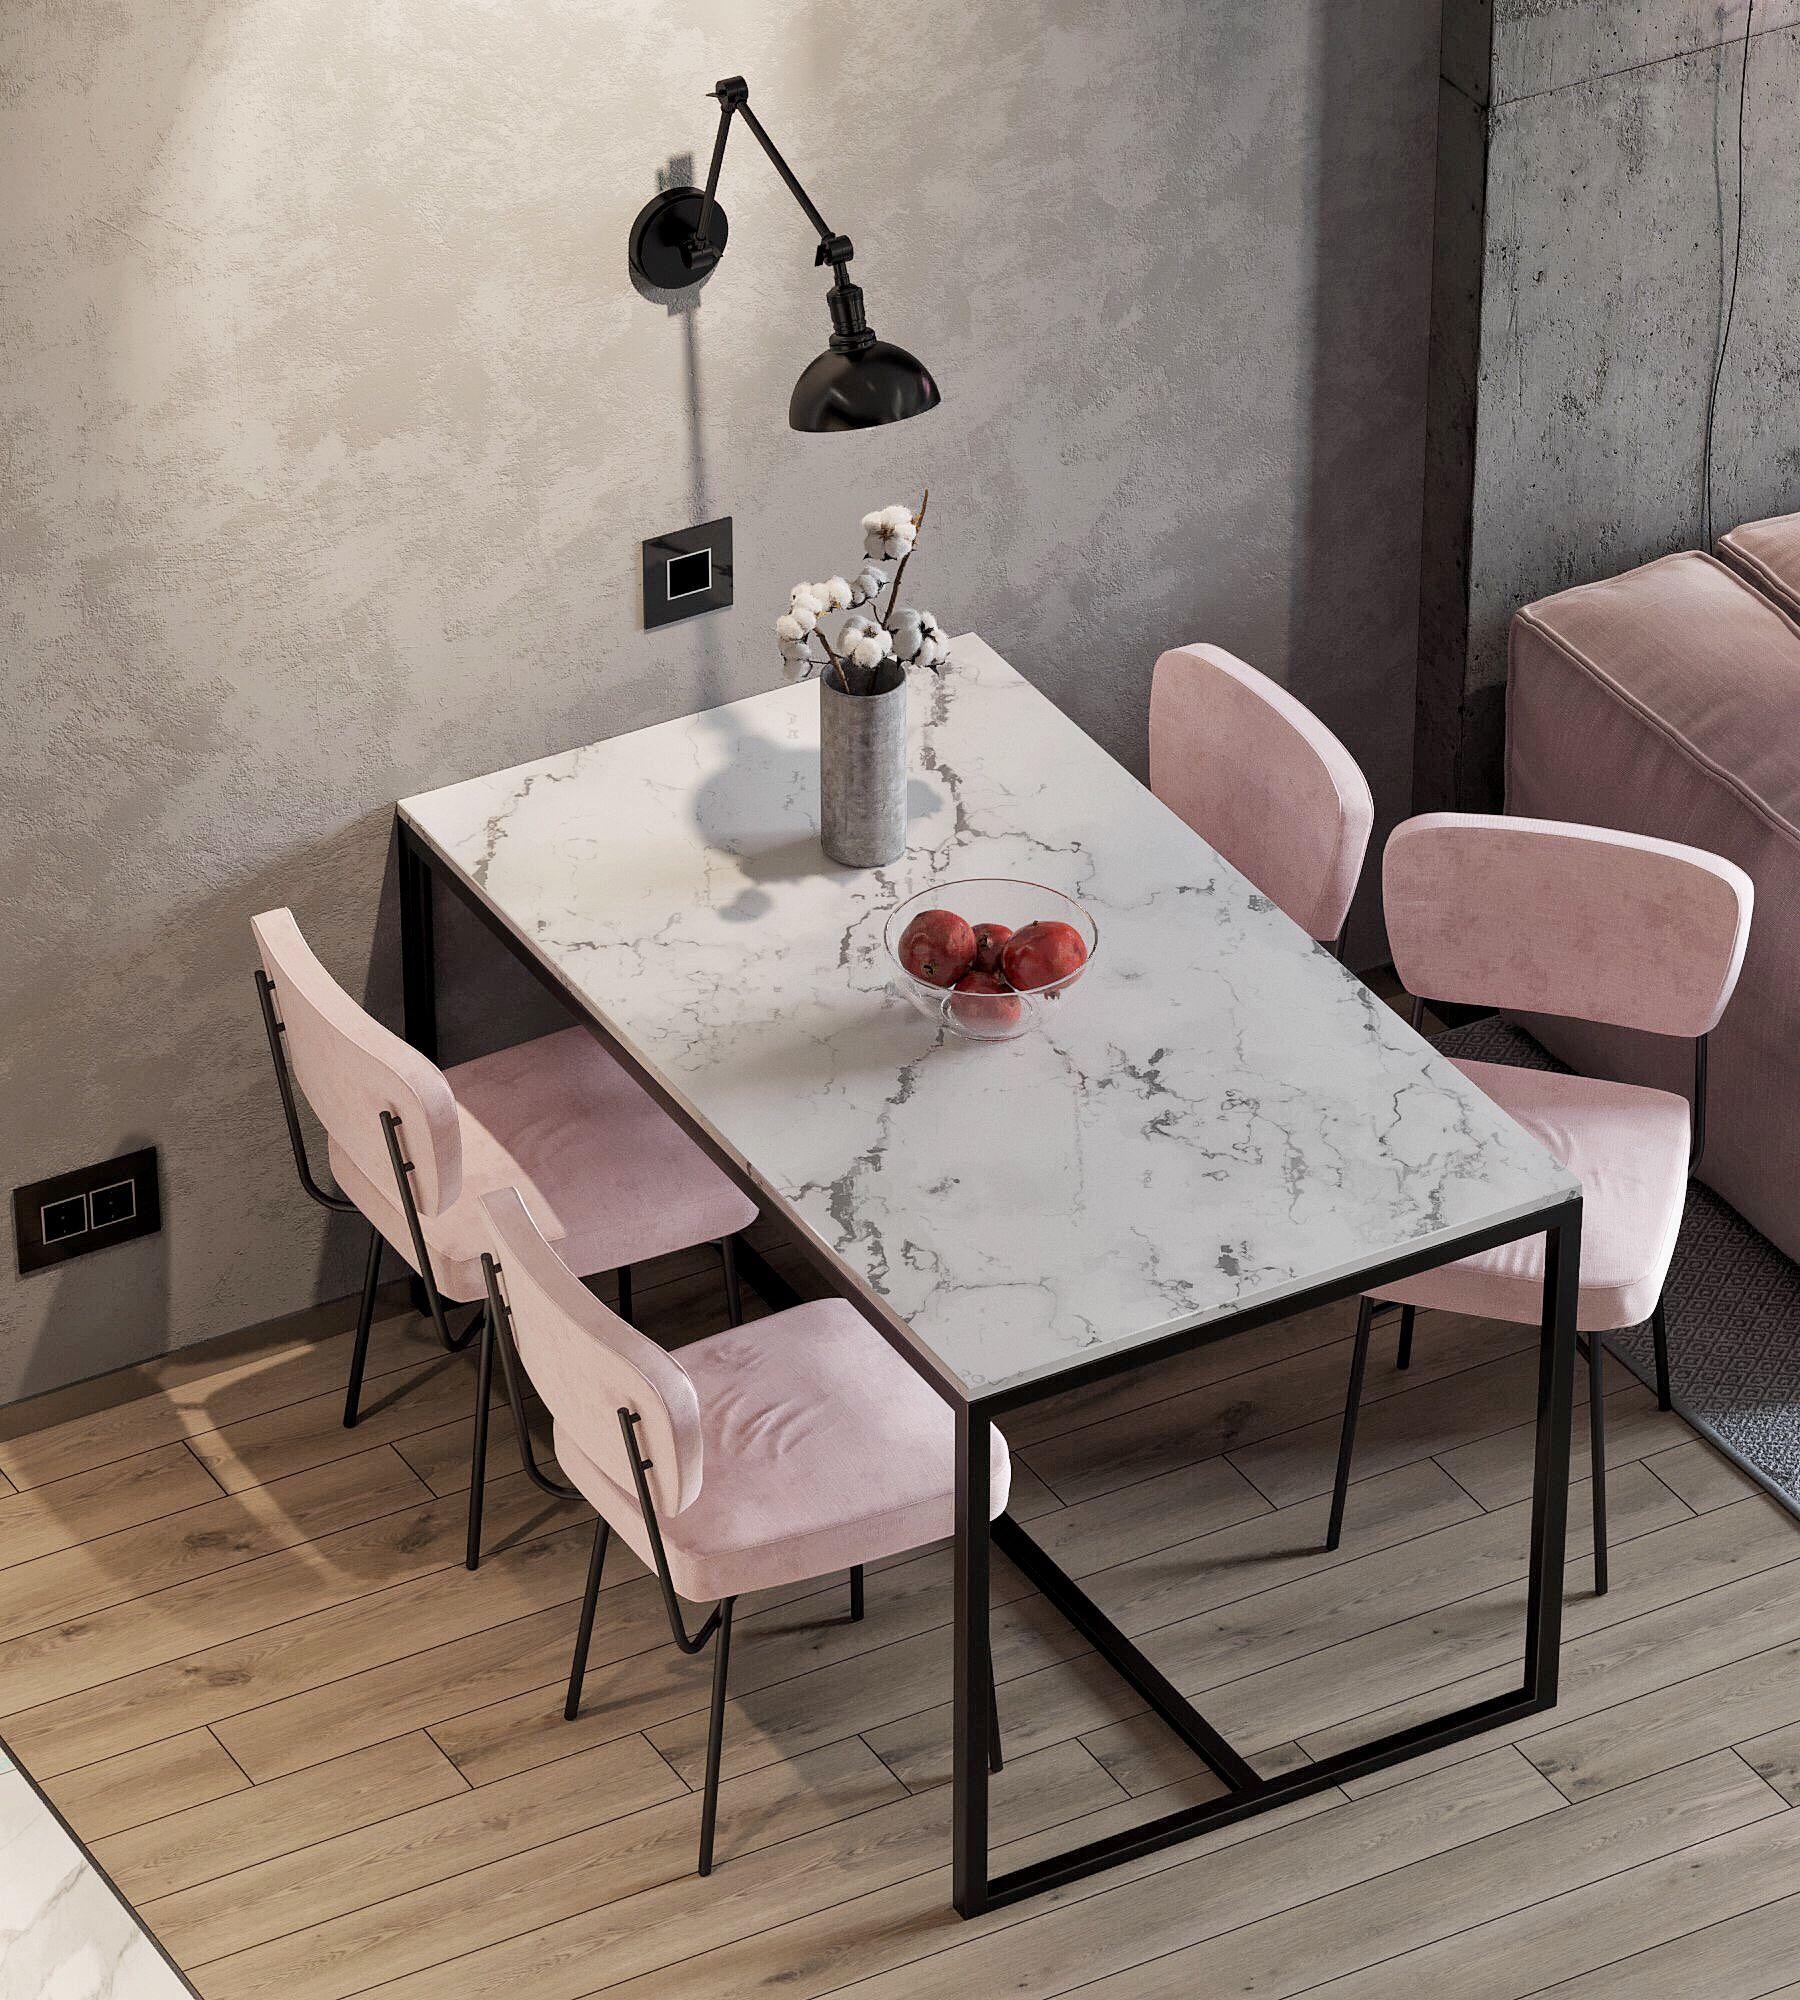 Pin By Daniela Sofan Moron On Home Decor In 2018 Pinterest